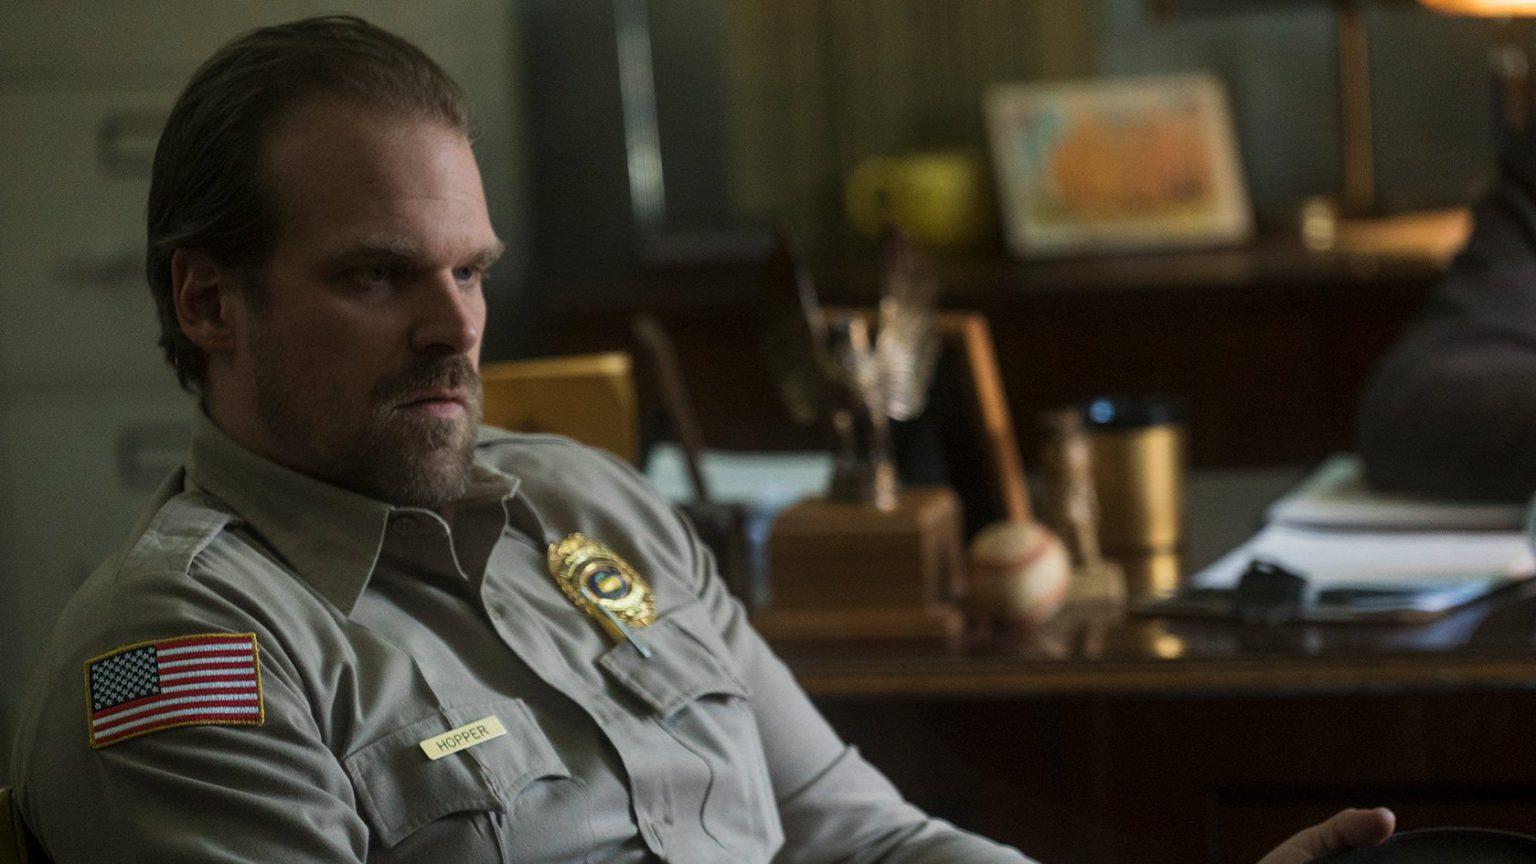 Police Chief Hopper